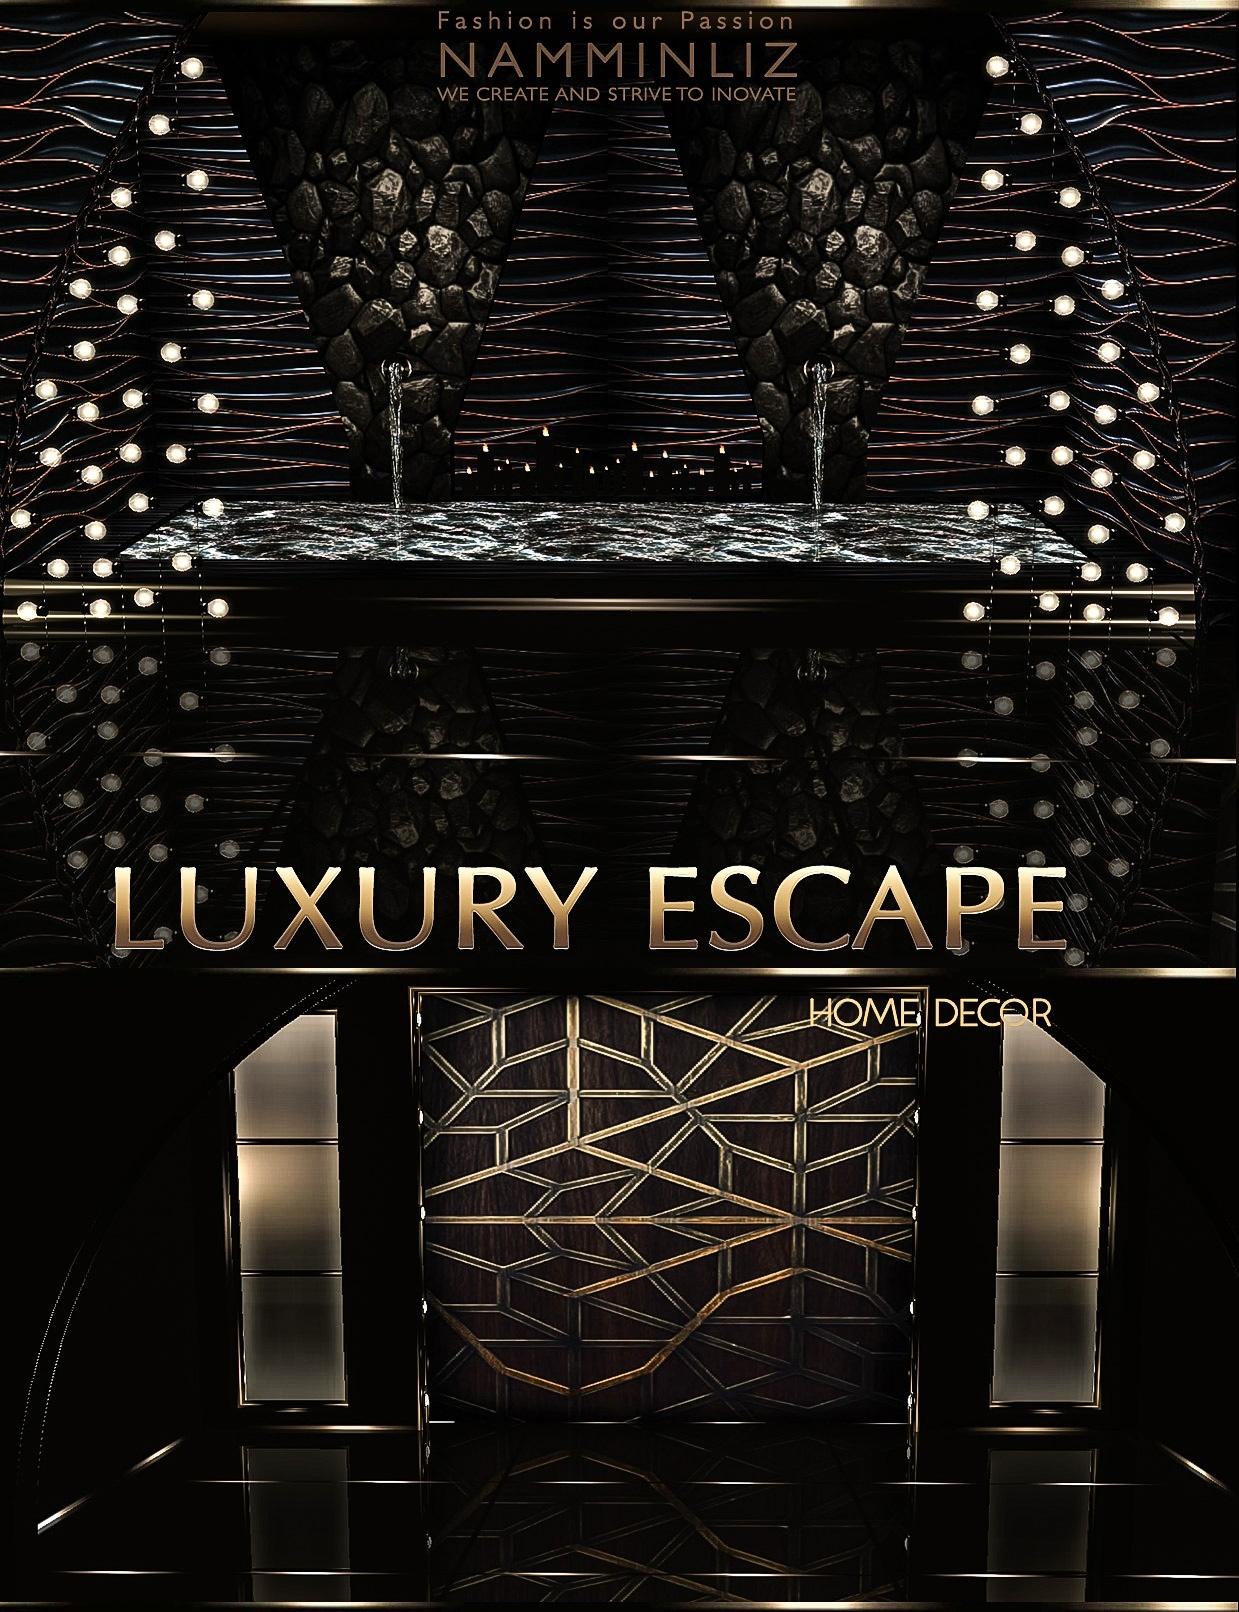 Luxury Escape Home decor imvu •27 Textures JPG •7.CHKN